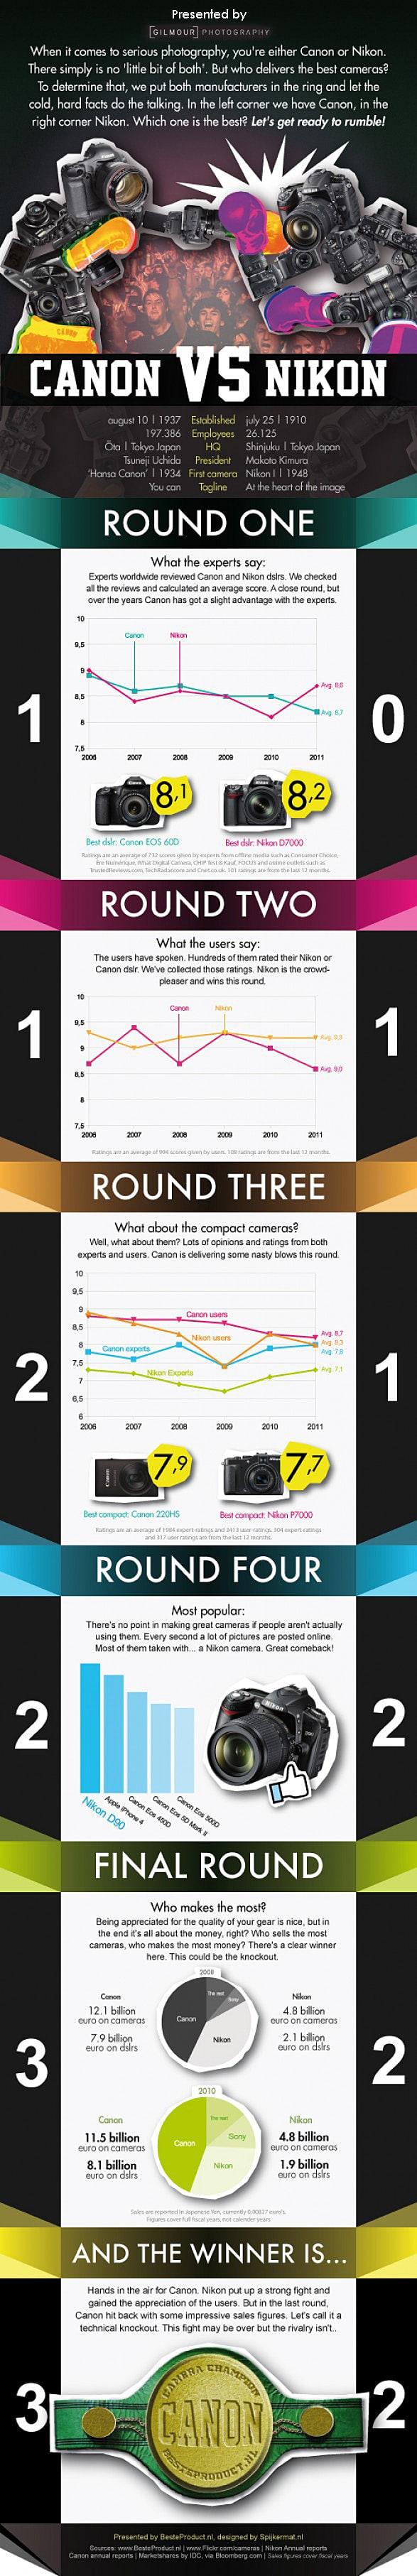 Canon vs Nikon infographic